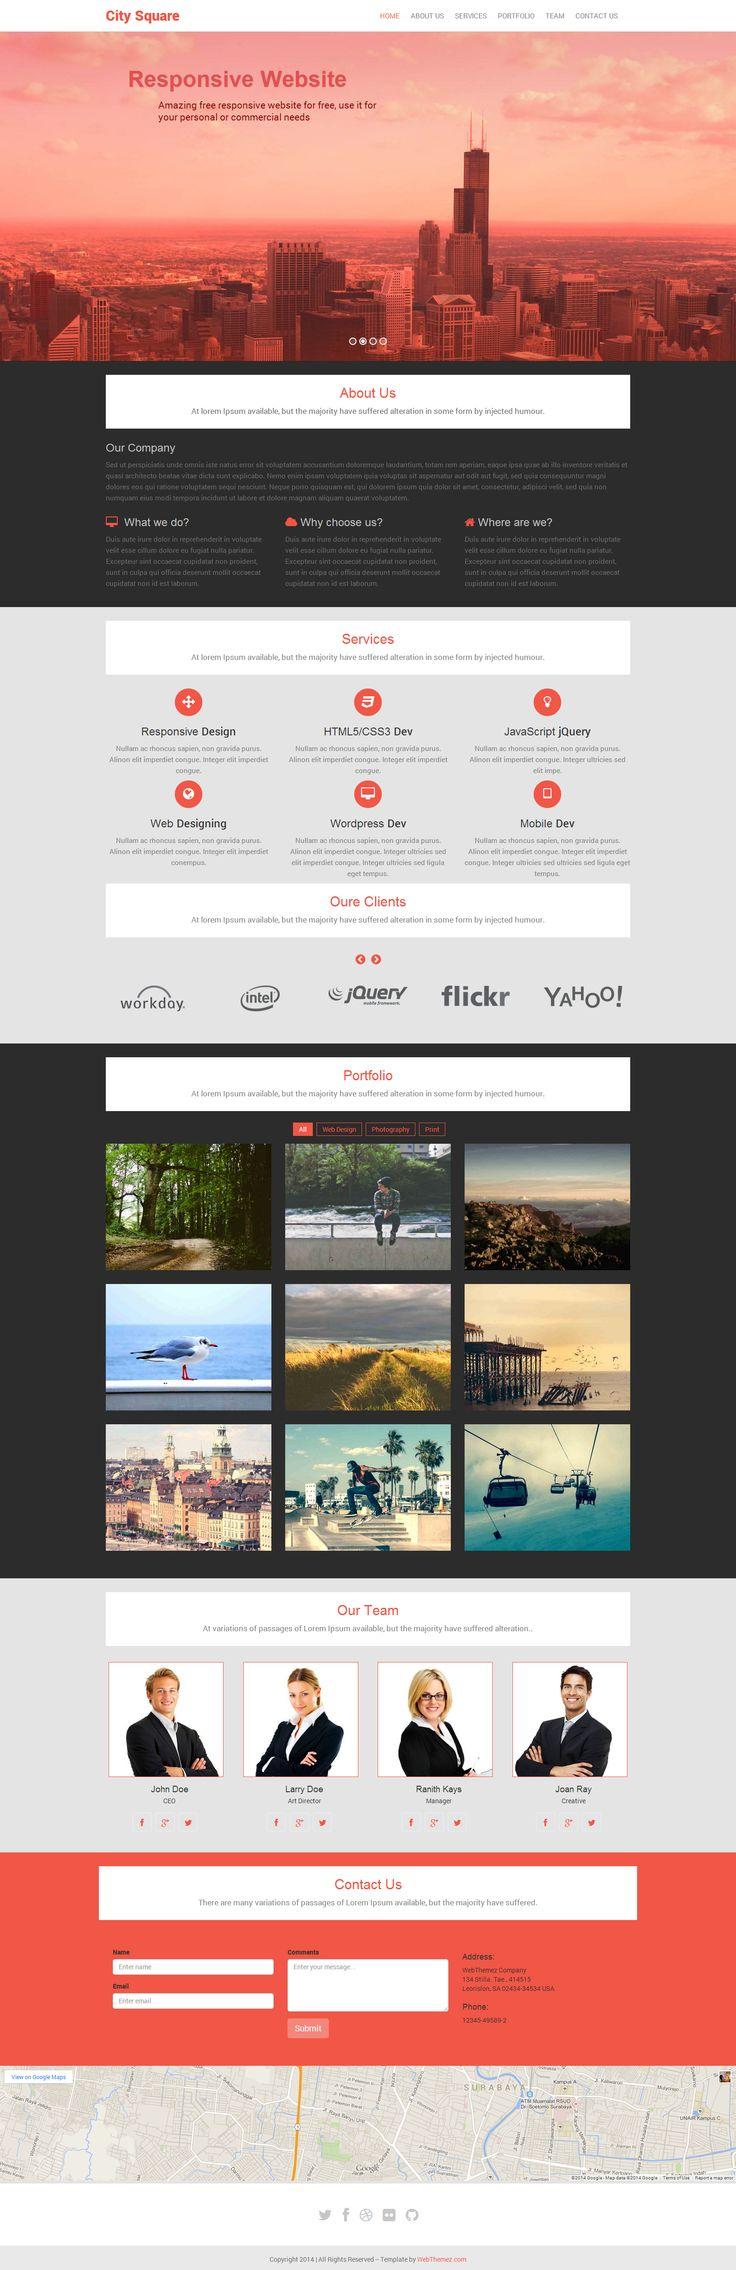 23 best Portfolio Websites images on Pinterest | Portfolio website ...